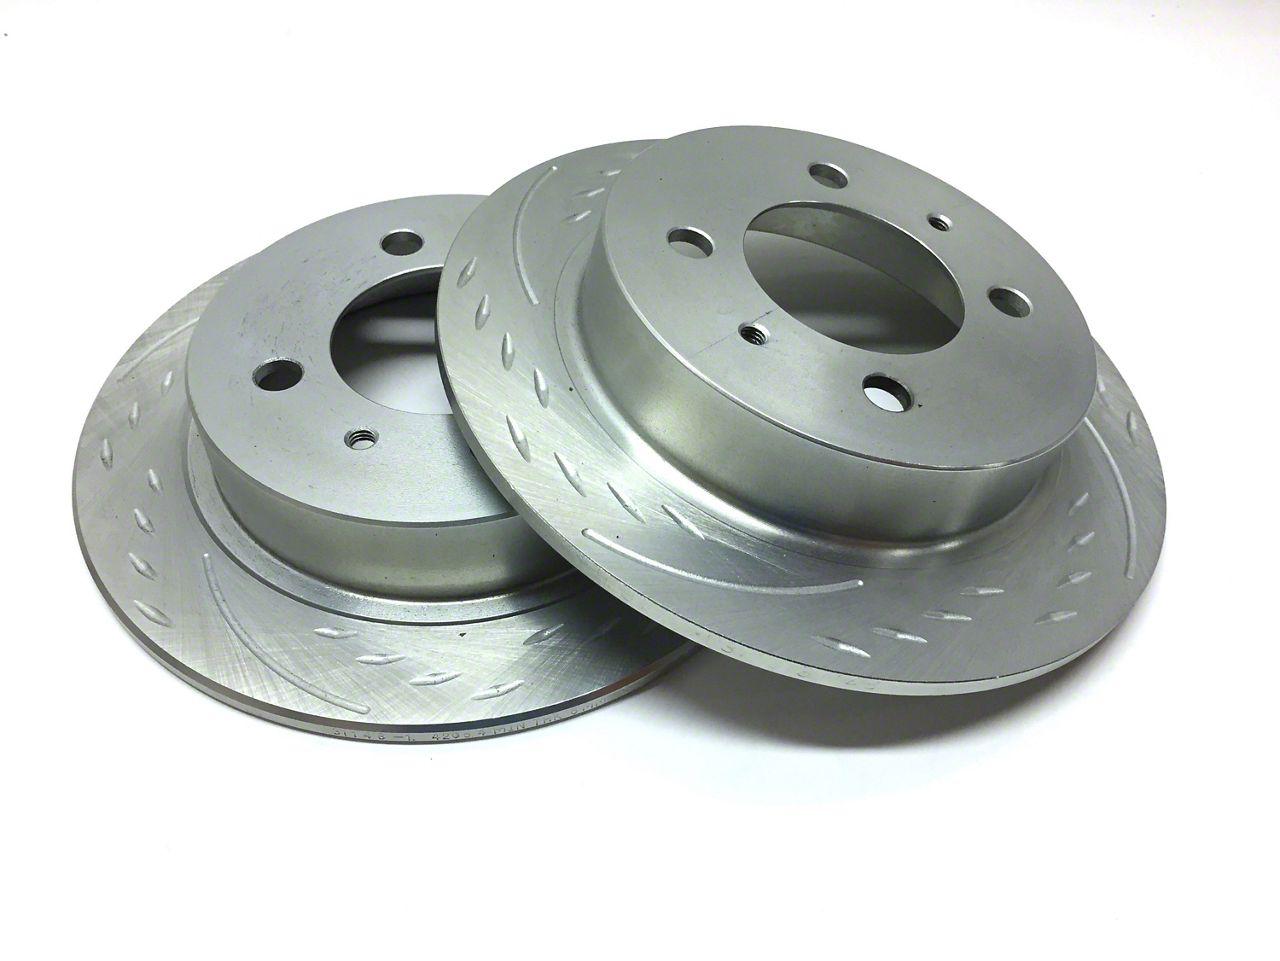 SP Performance Diamond Slot Rotors w/ Silver Zinc Plating - Front Pair (02-18 RAM 1500)